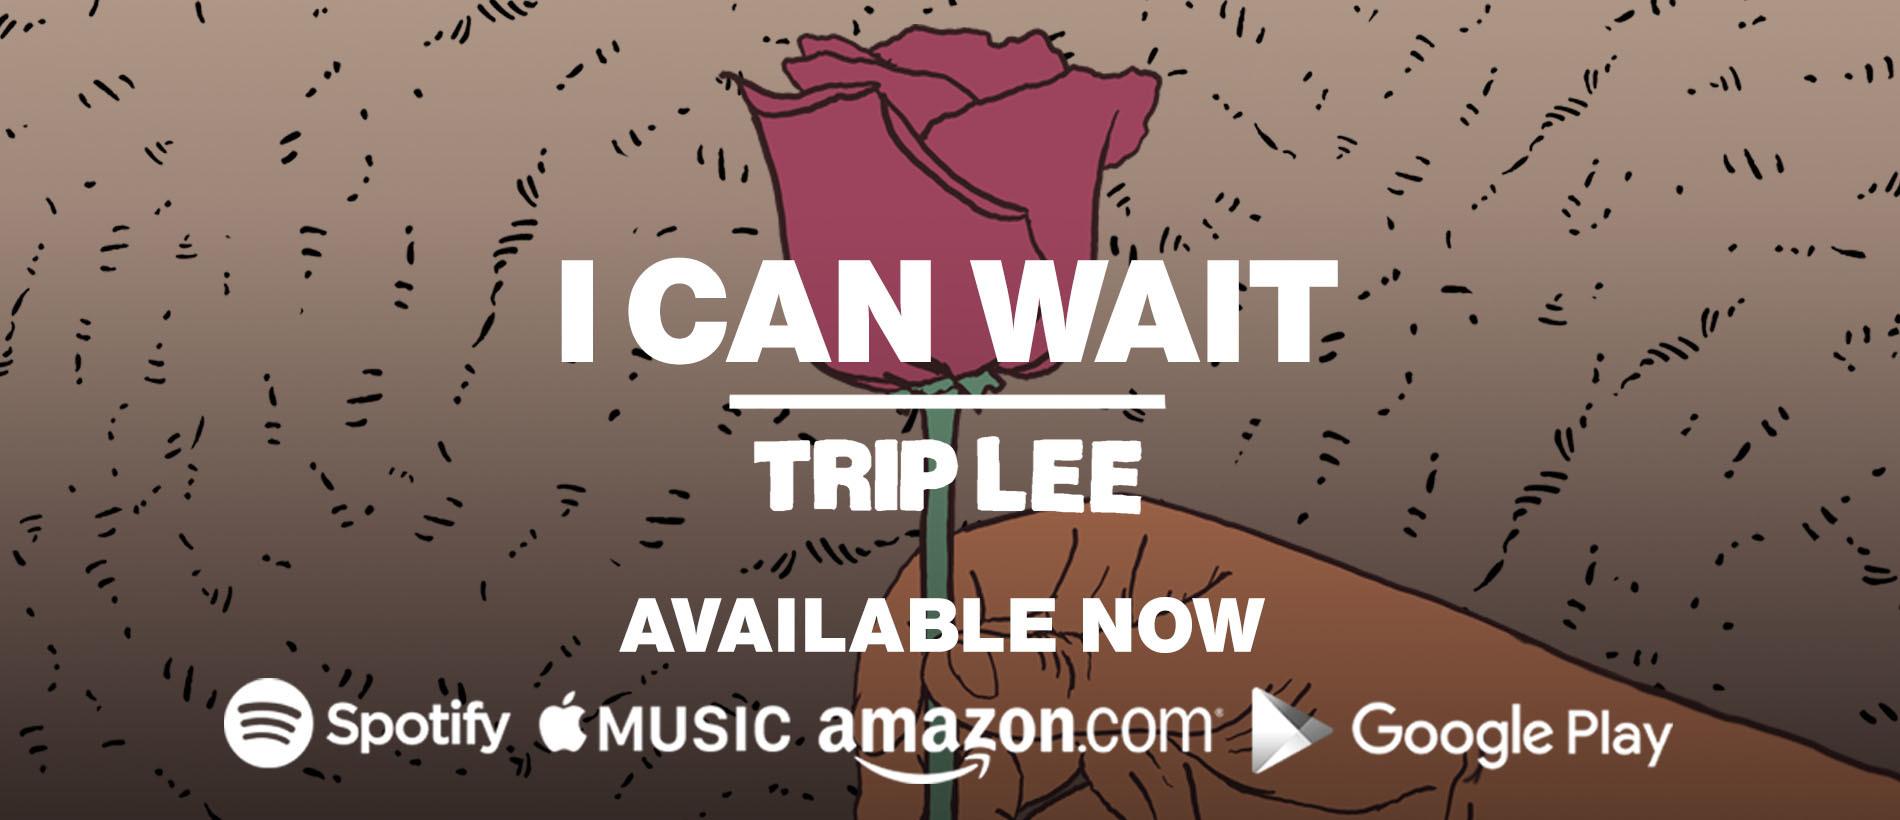 TRIP LEE X I CAN WAIT